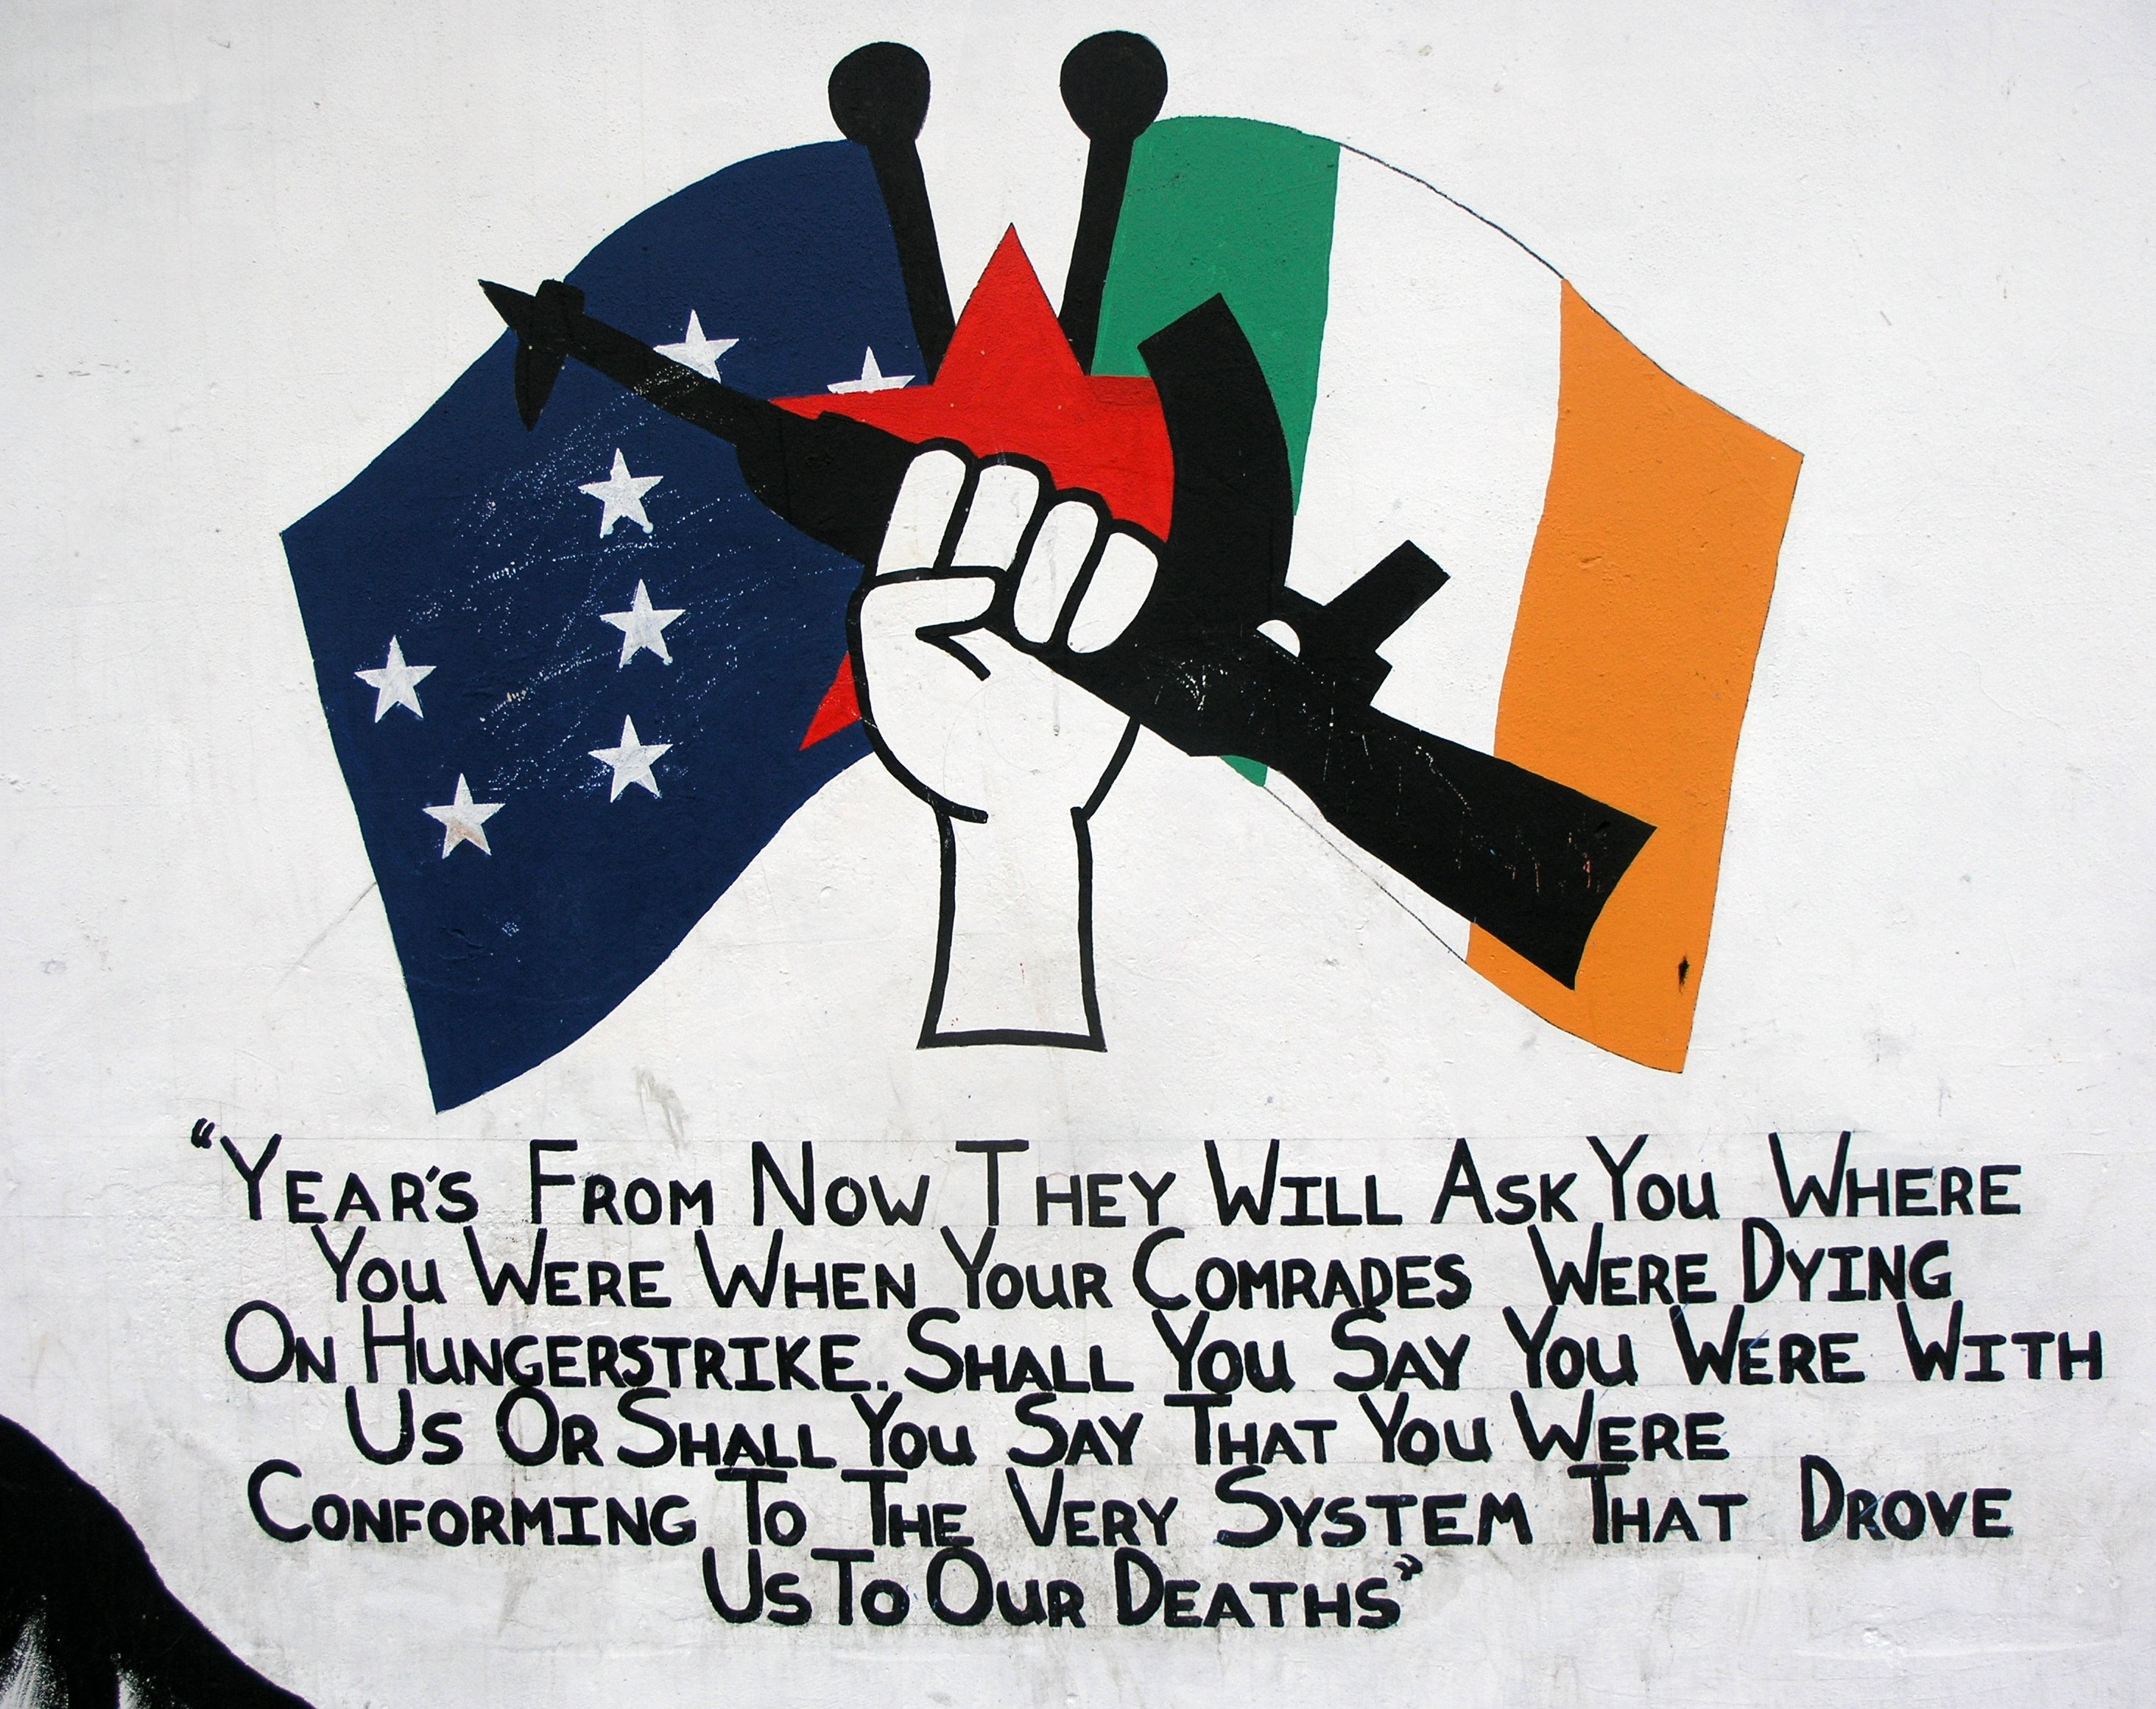 Irish Republican Army Posters Separatist paramilitary